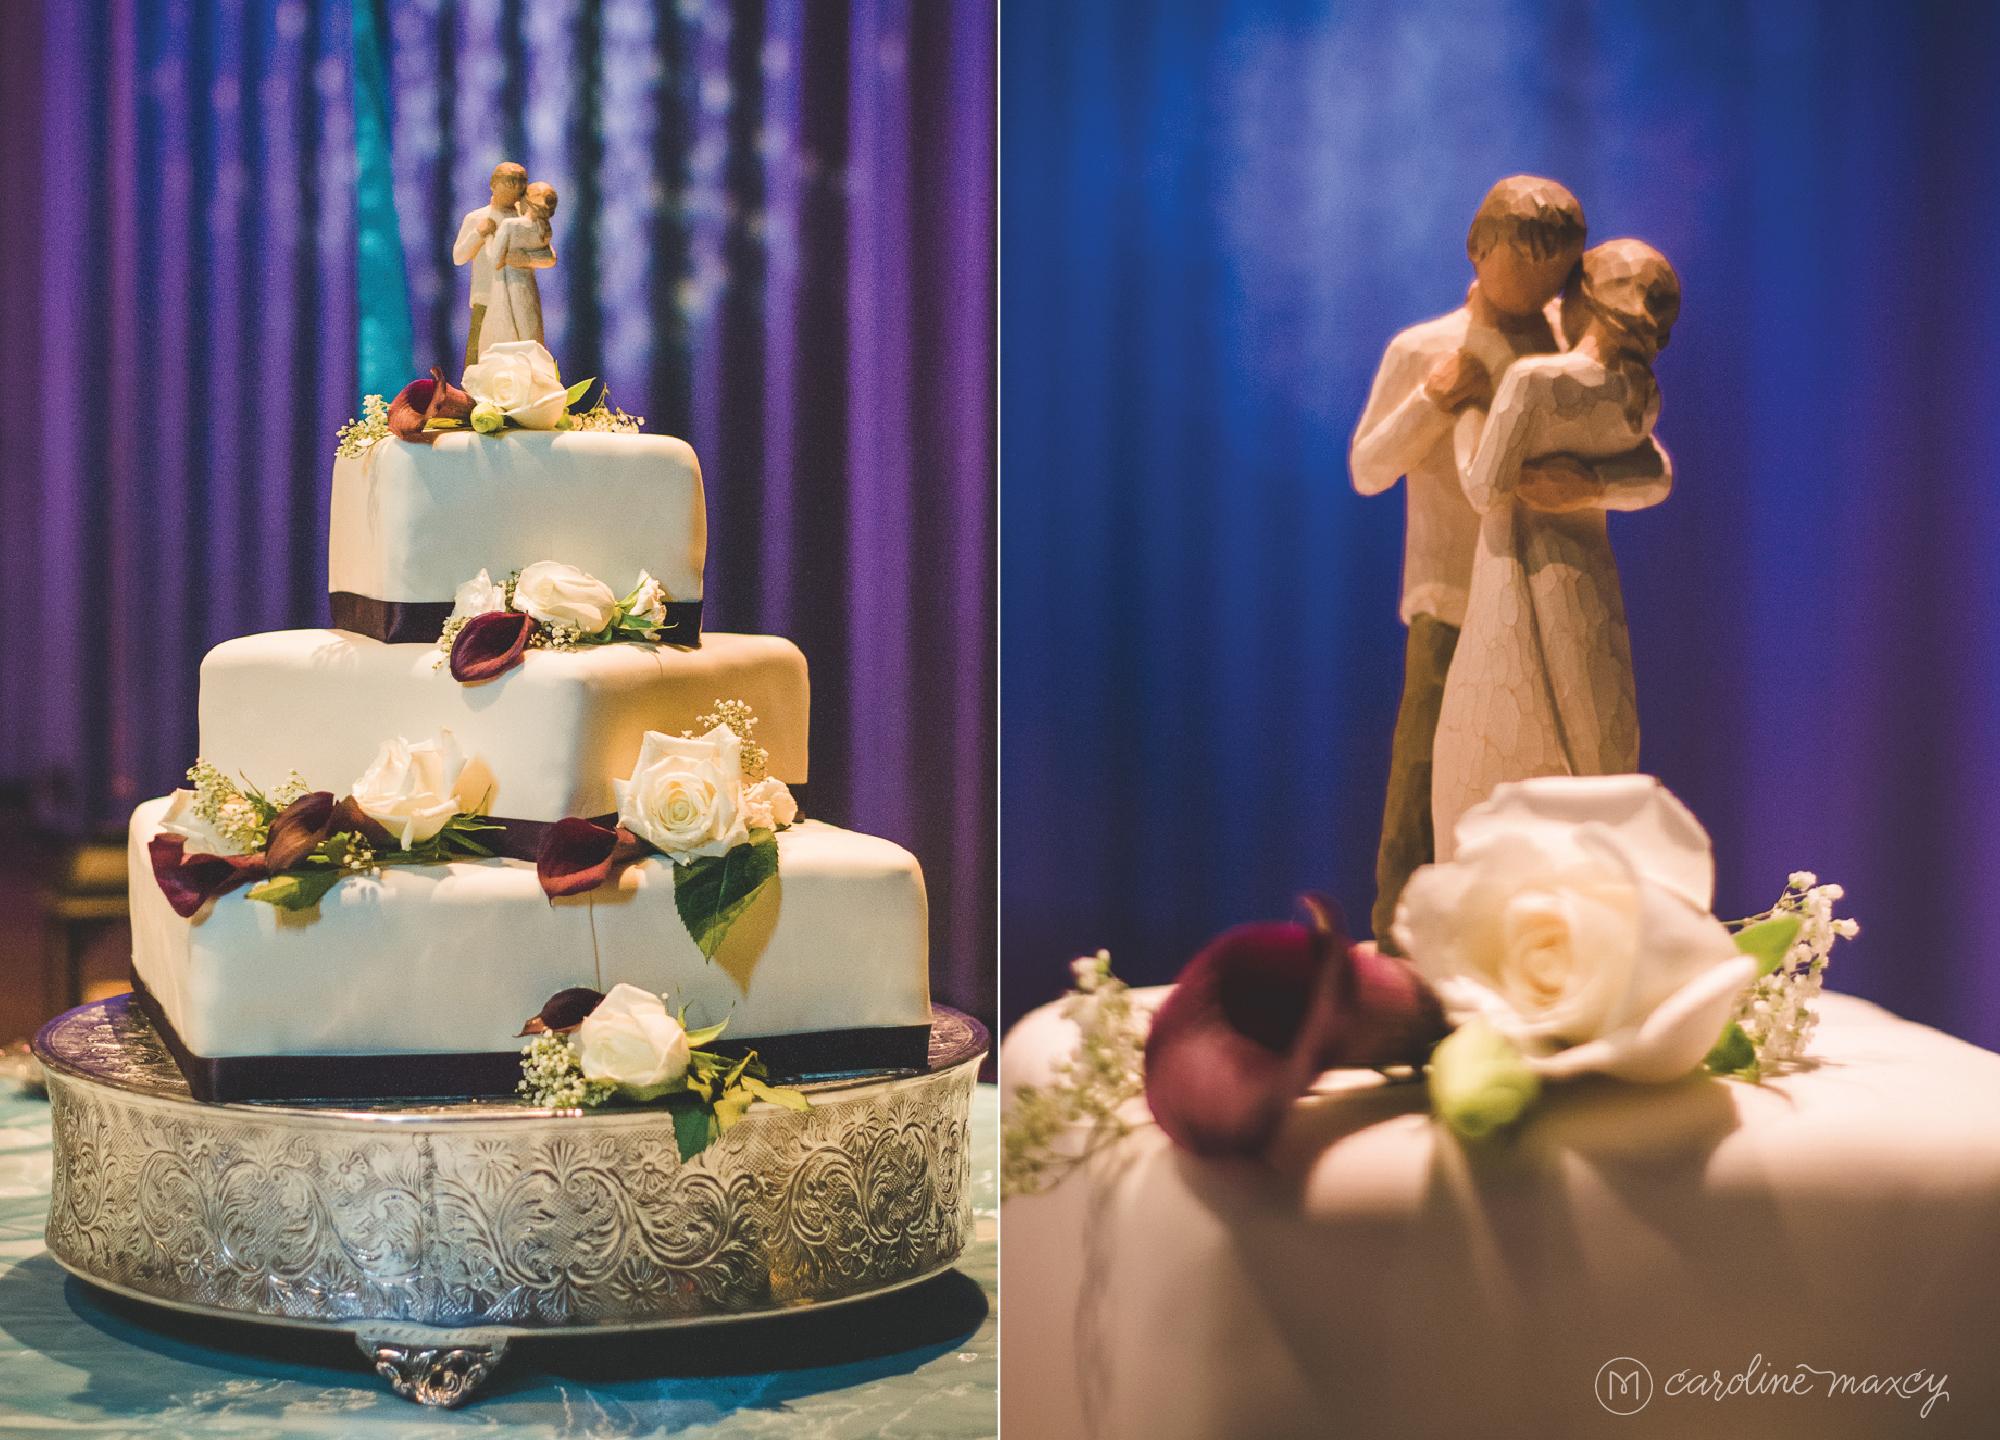 2014_02_12_RoseJohnny_Wedding_blog22.jpg